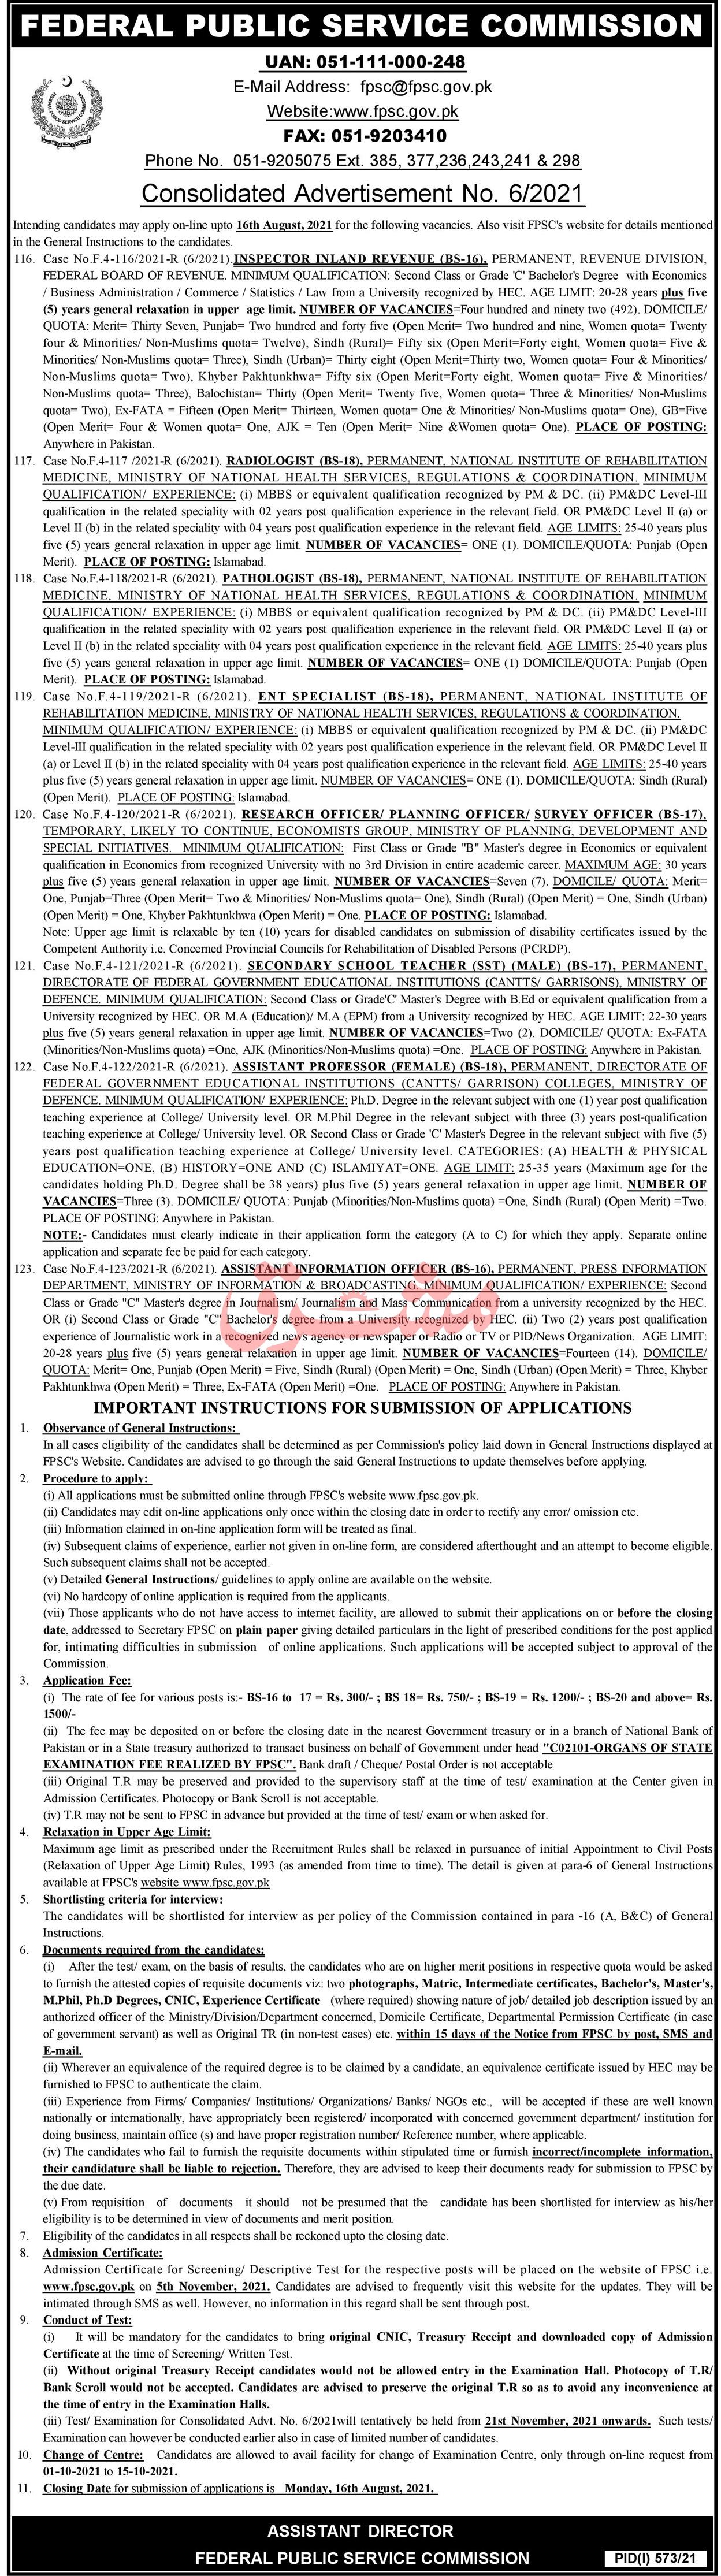 FPSC 1st August  2021 Jobs 2021